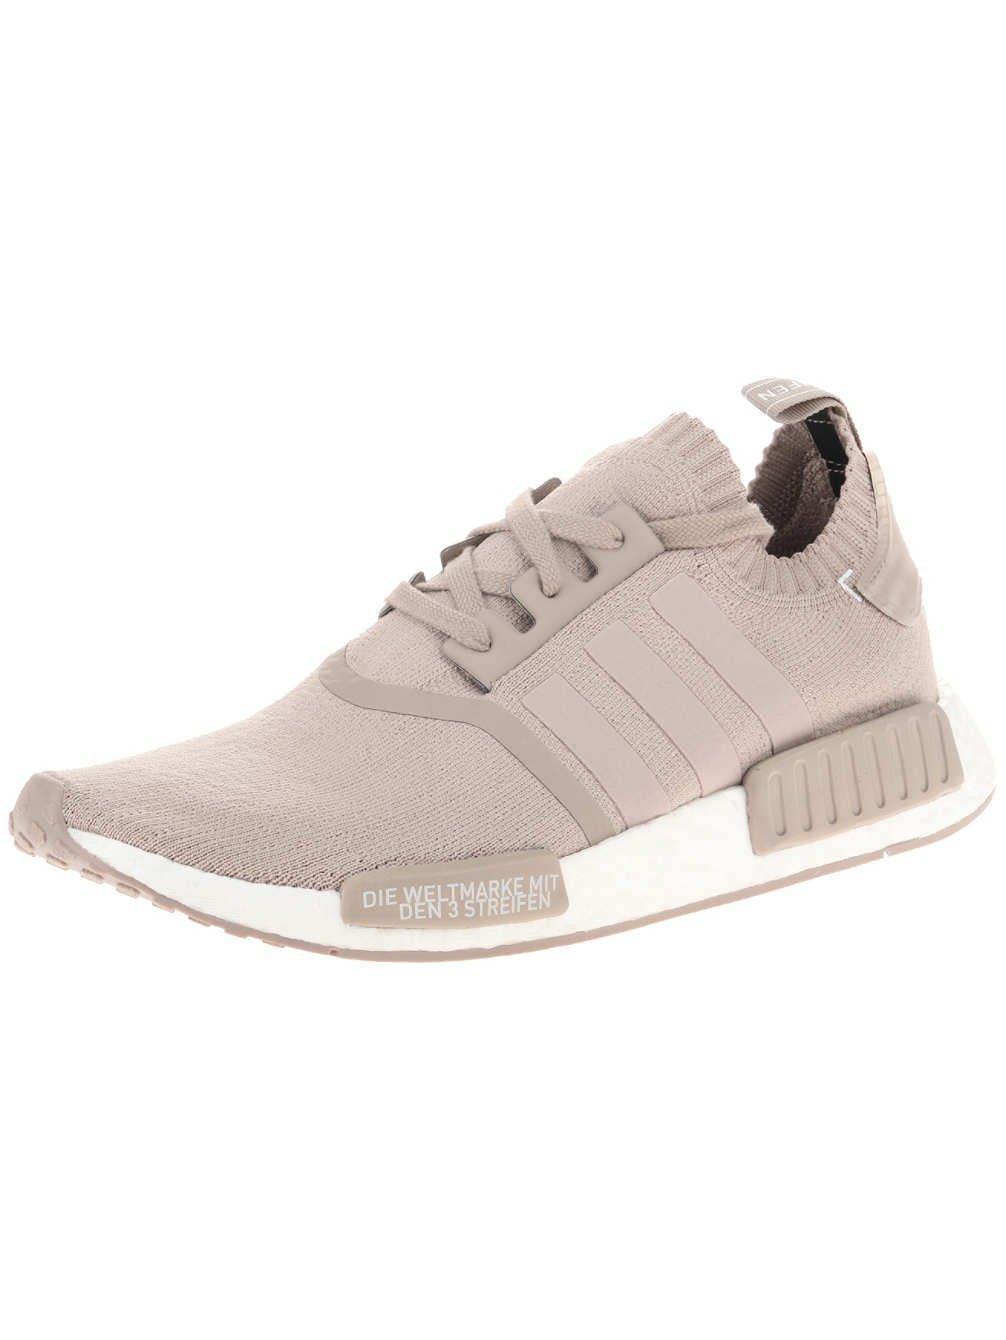 adidas Originals Women's NMD_r1 W Pk Sneaker B01HHA5UCI 11 D(M) US|Cbeige/Cbeige/Cwhite